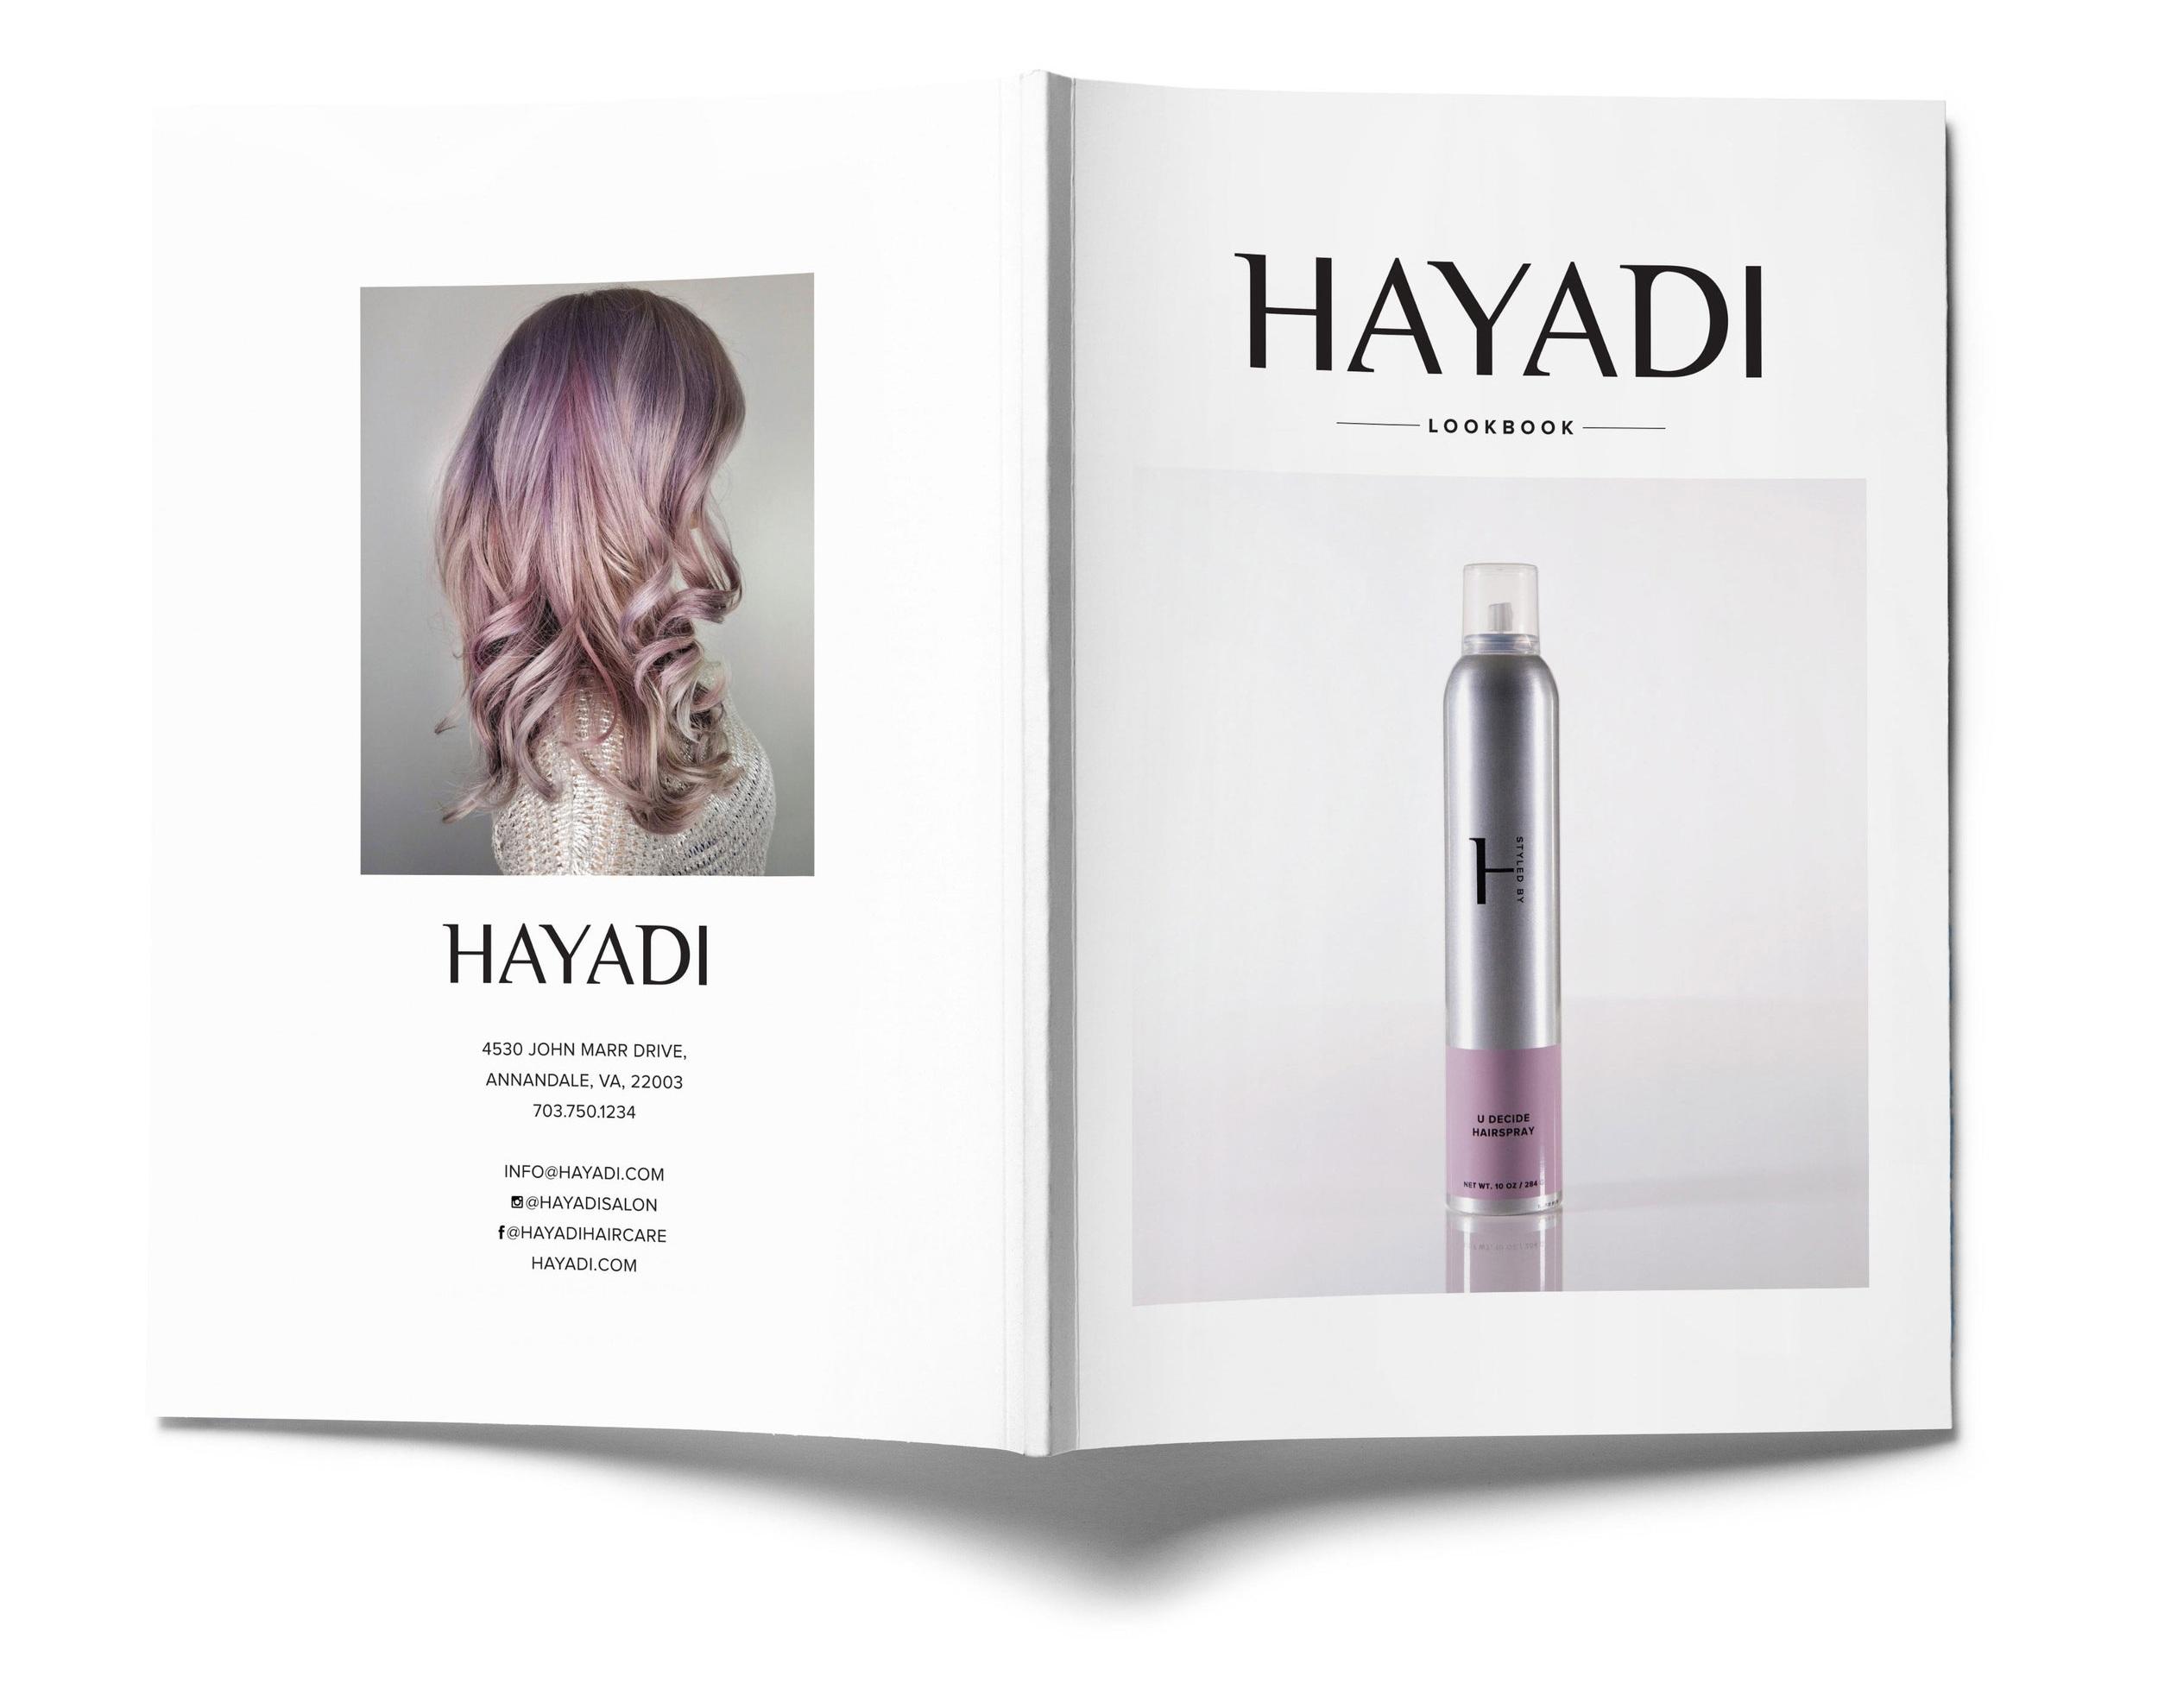 HAYADI-MAG-FRONTBACK copy.jpg